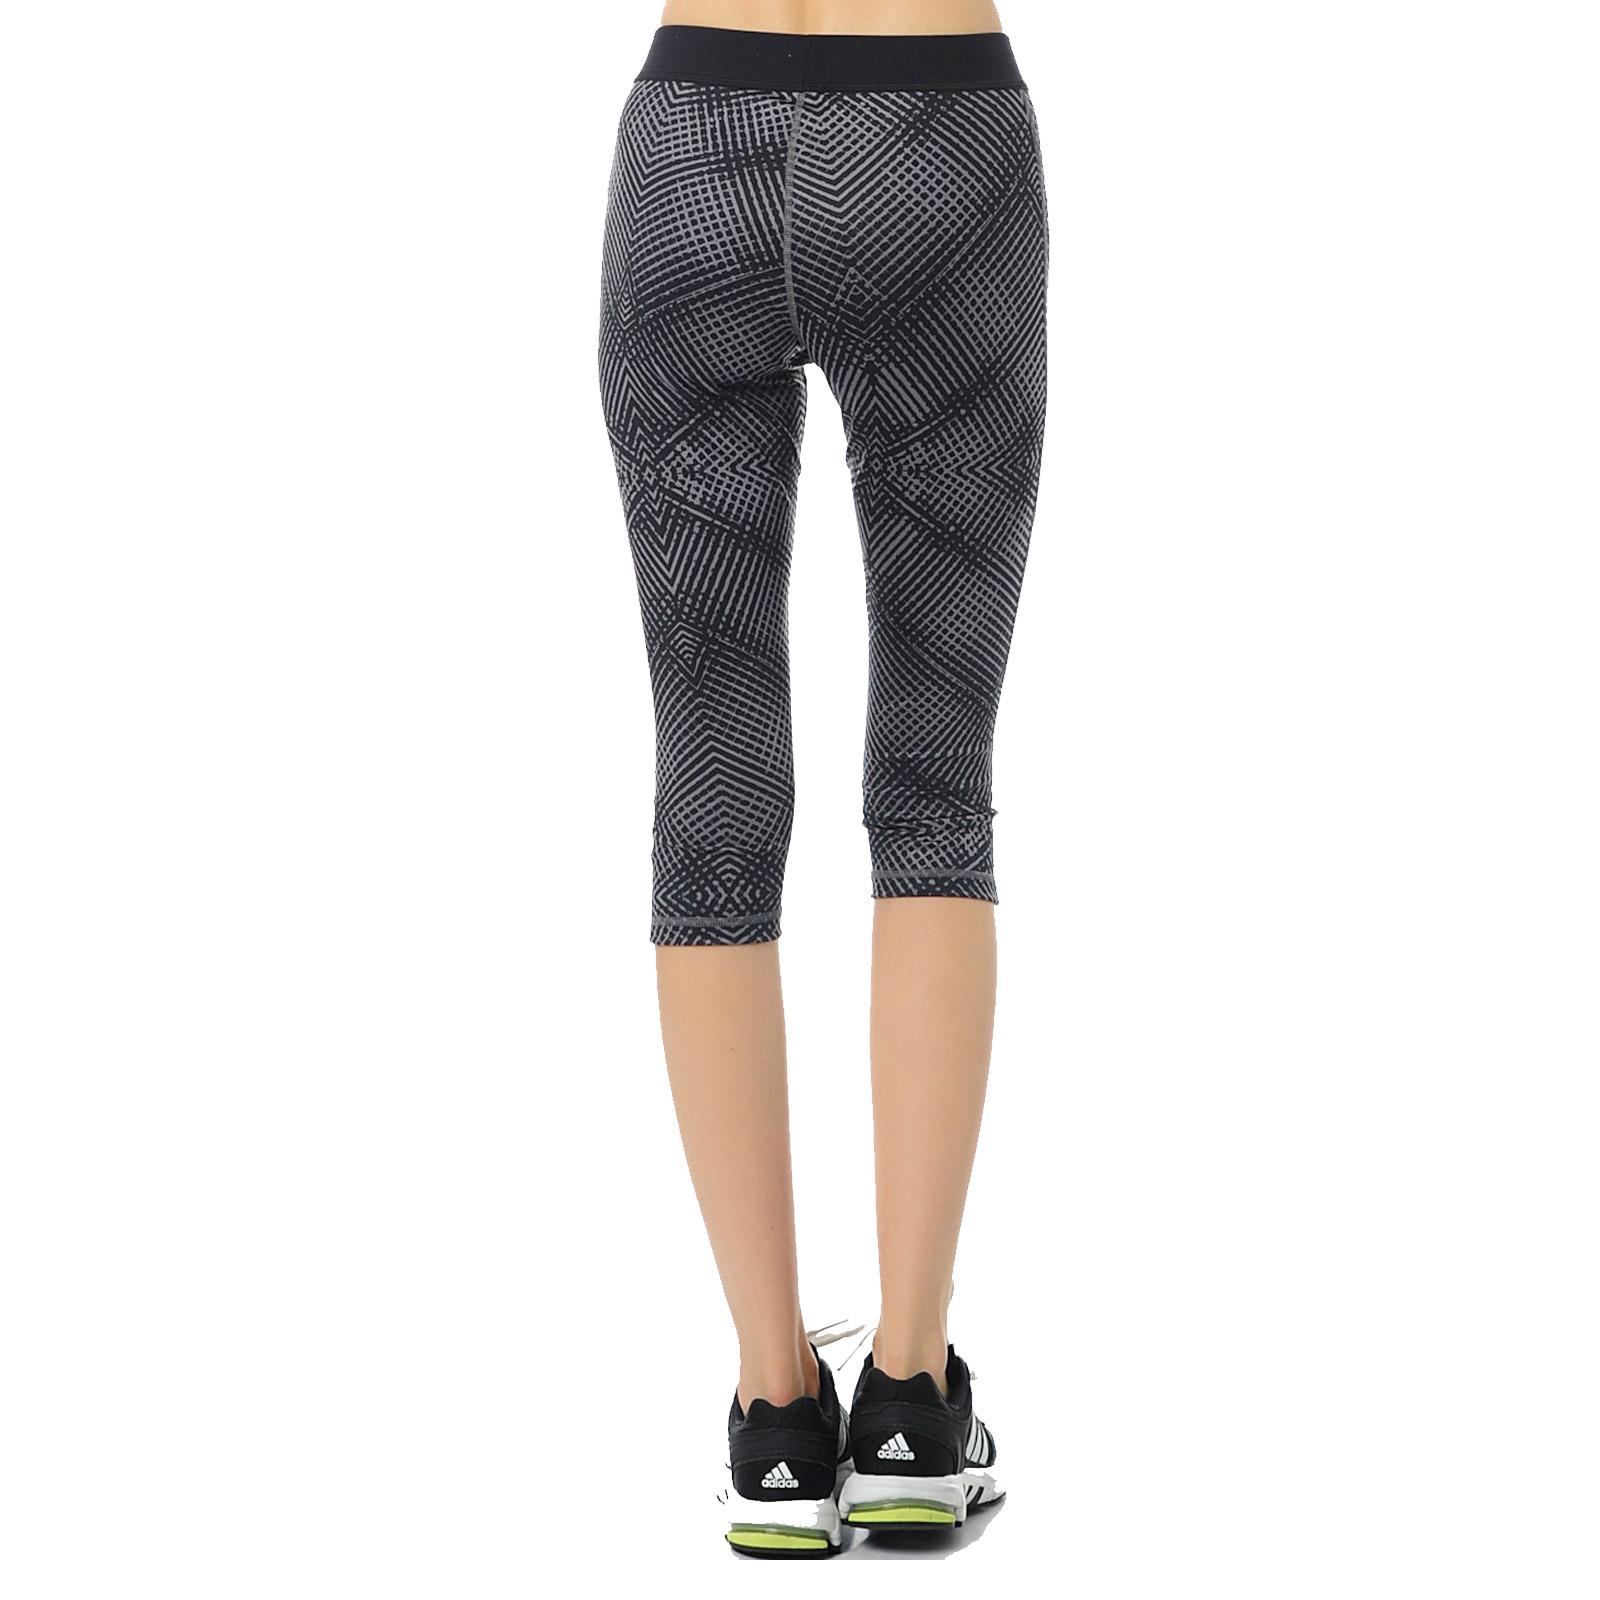 Popular Adidas Performance Womens Response Long Running Tights Gym Pants Black